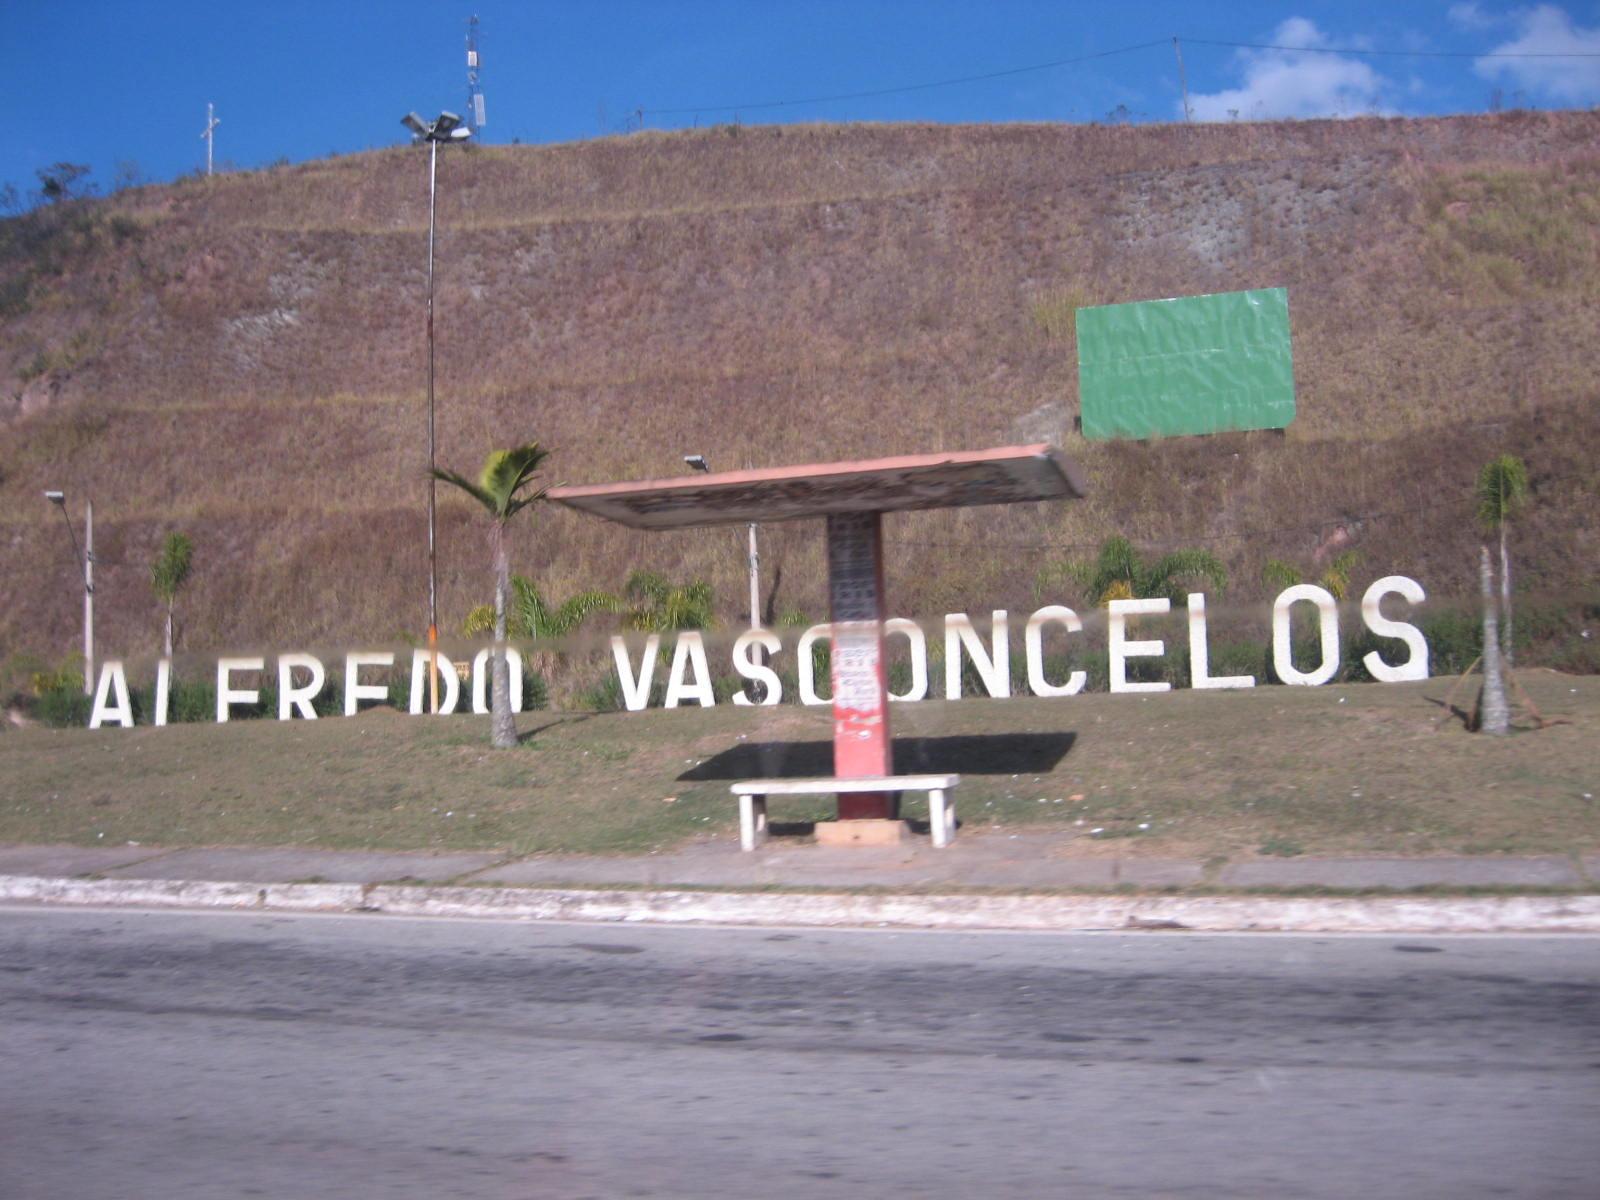 Alfredo Vasconcelos Minas Gerais fonte: upload.wikimedia.org